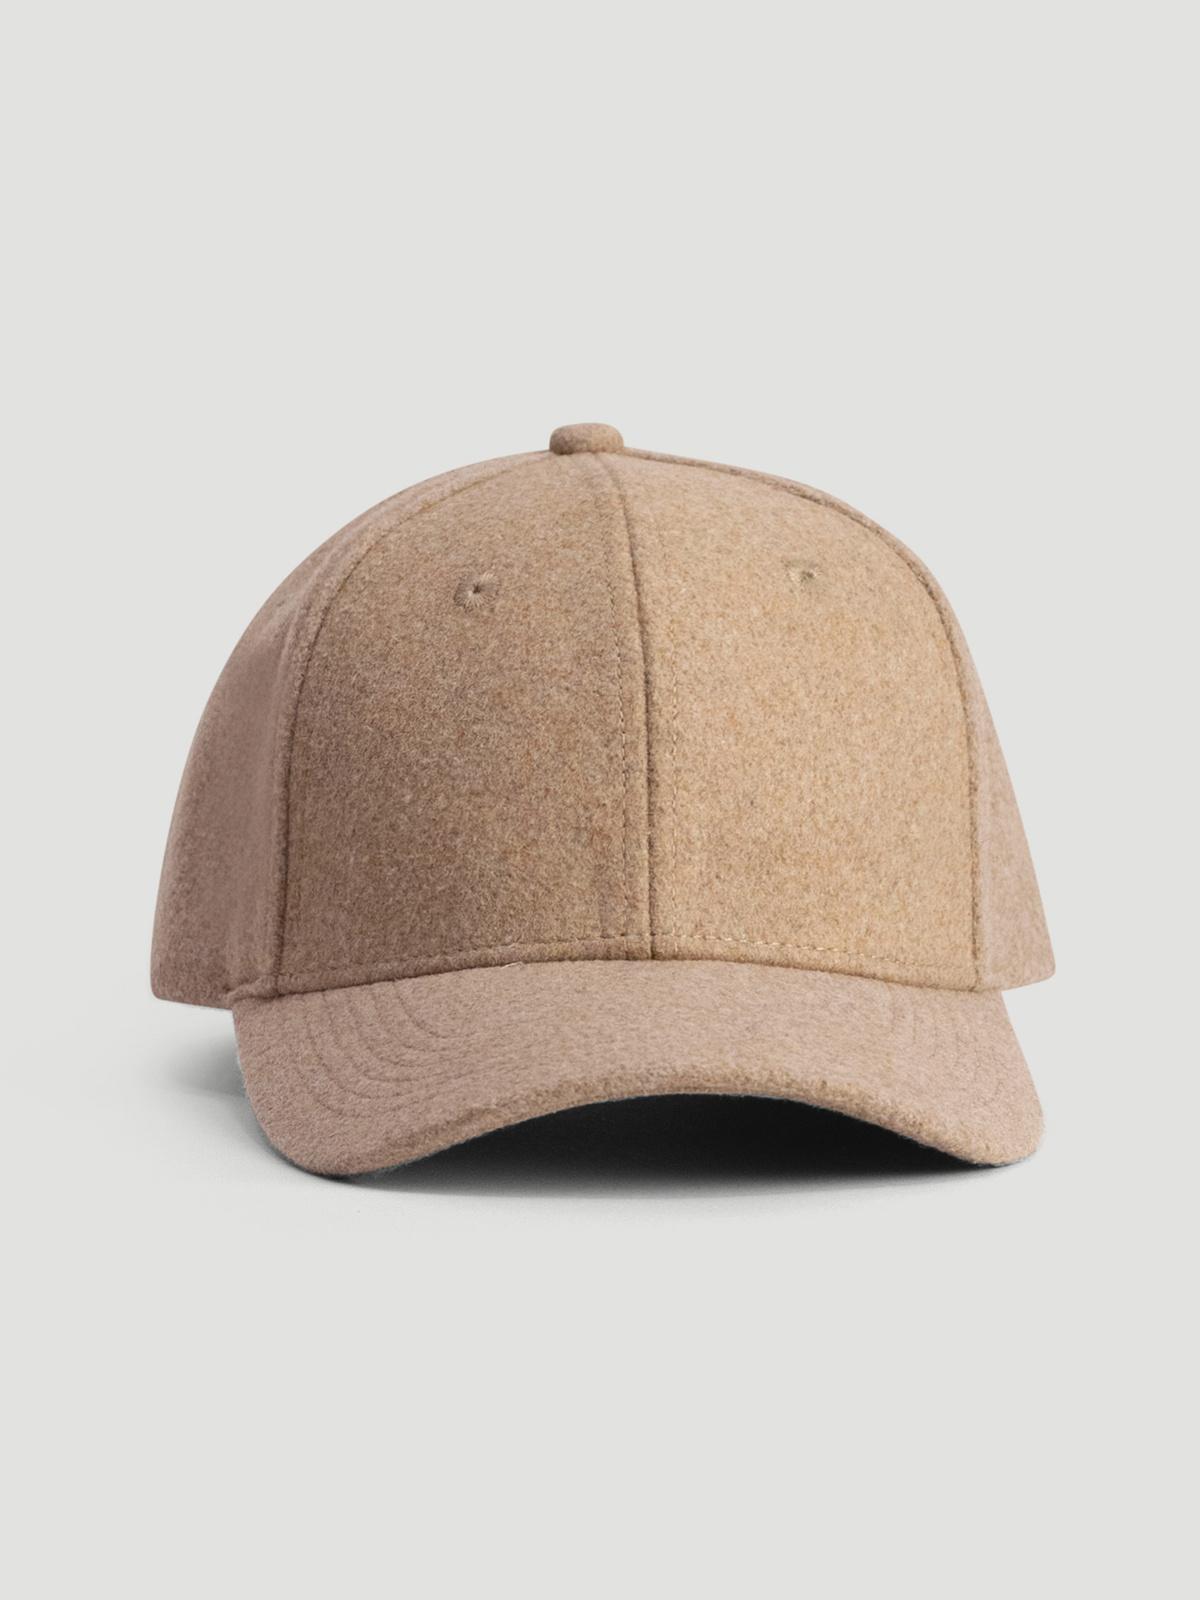 Holzweiler Wool Caps  Beige 3